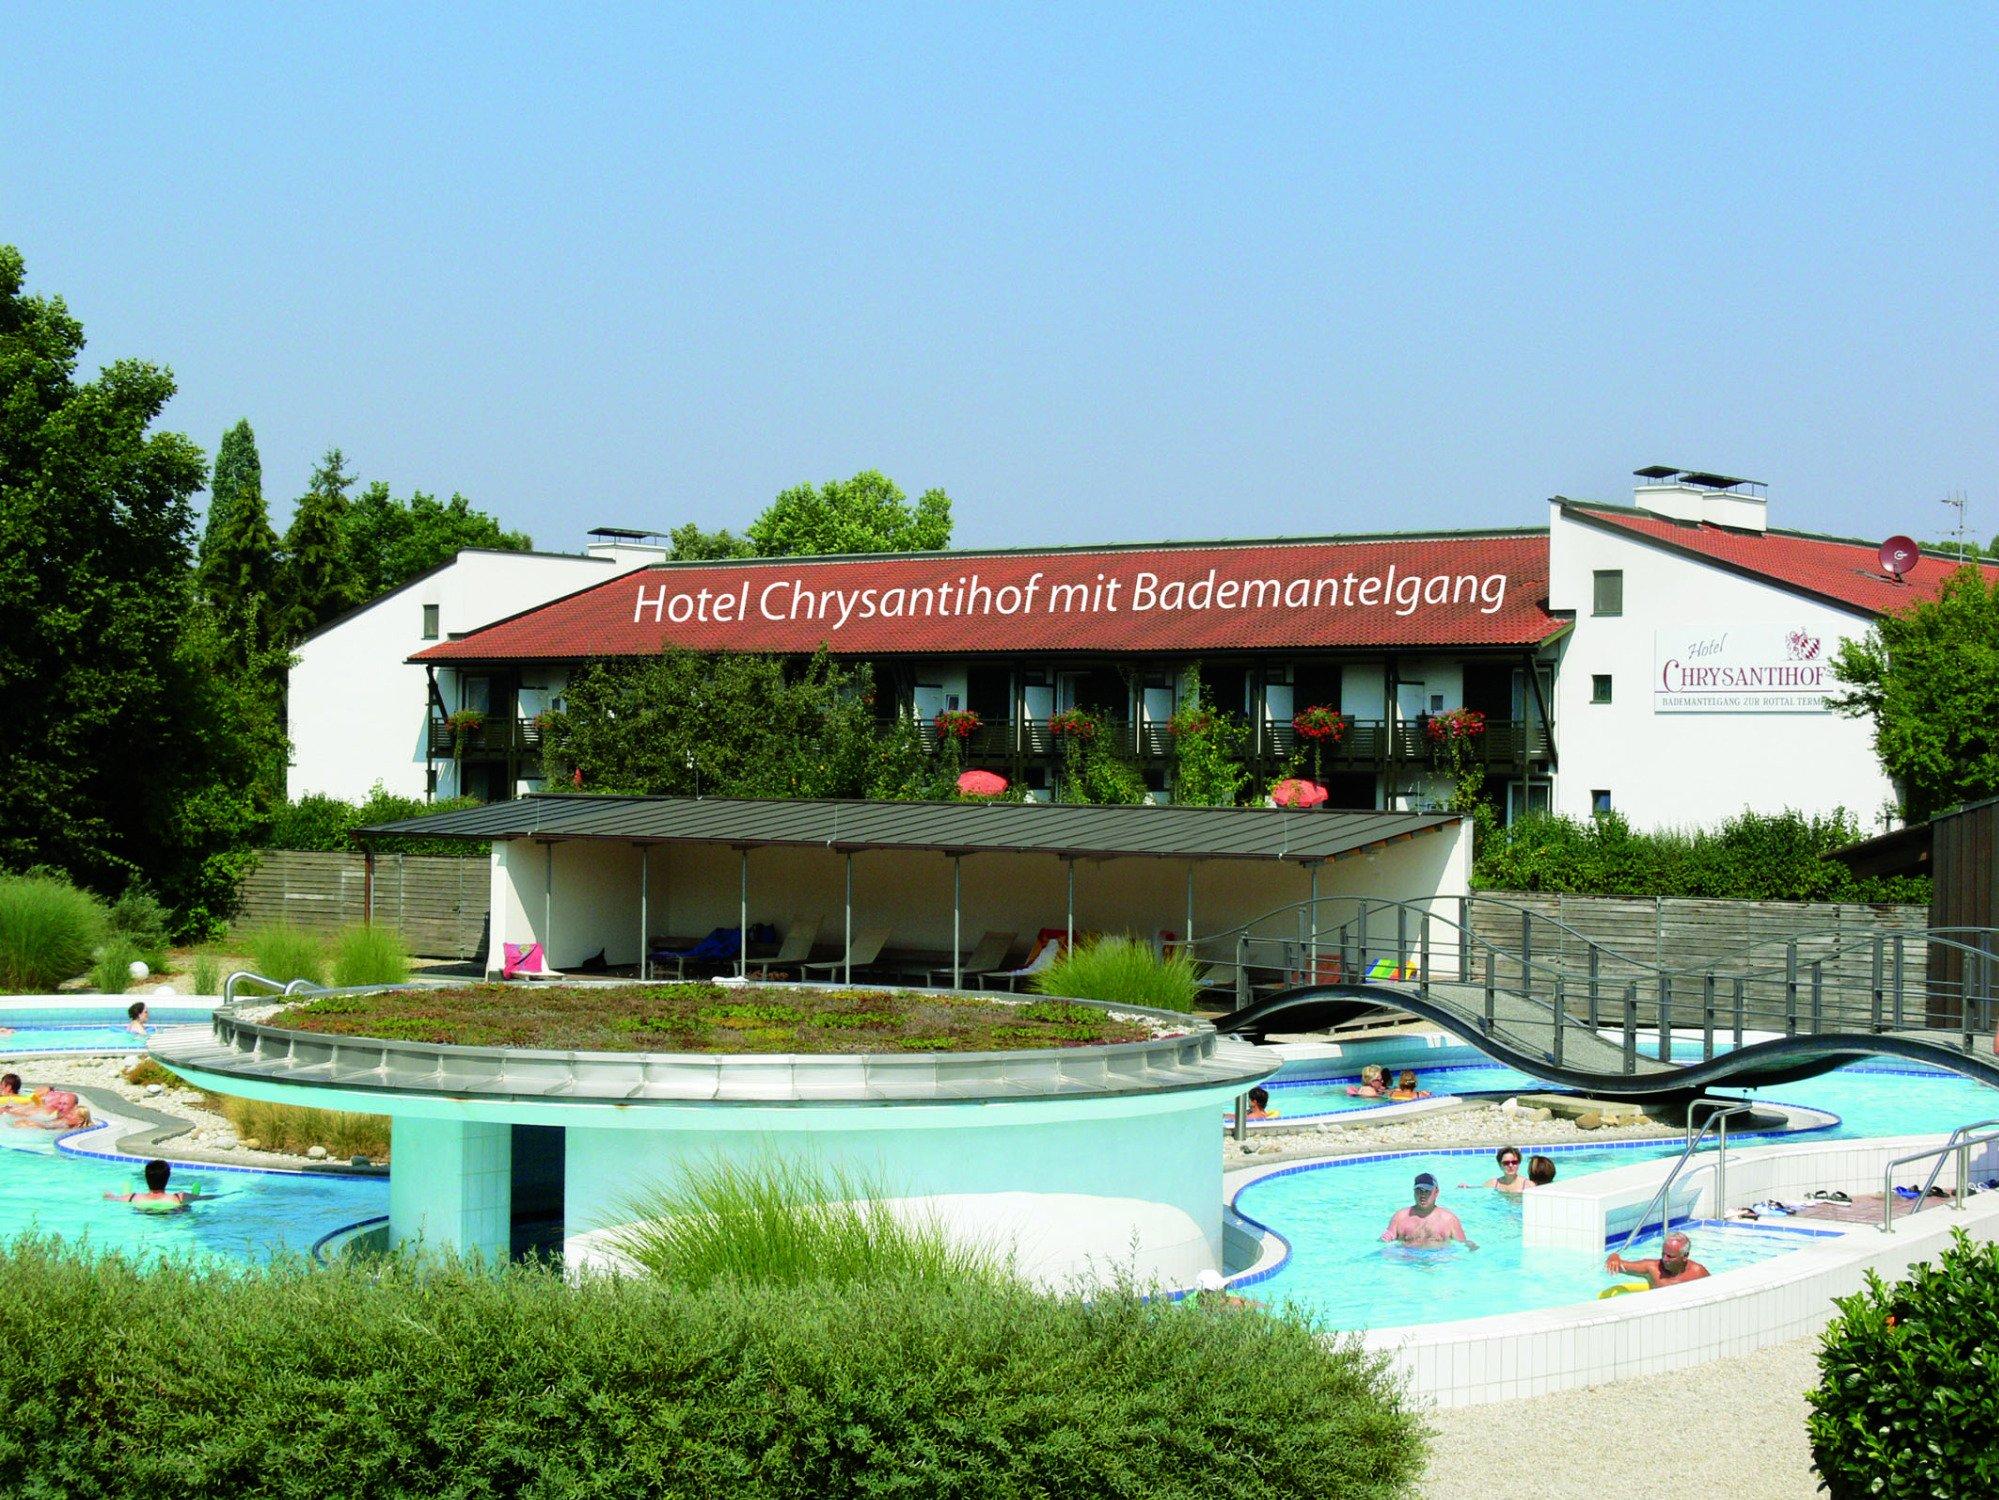 Hotel Chrysantihof